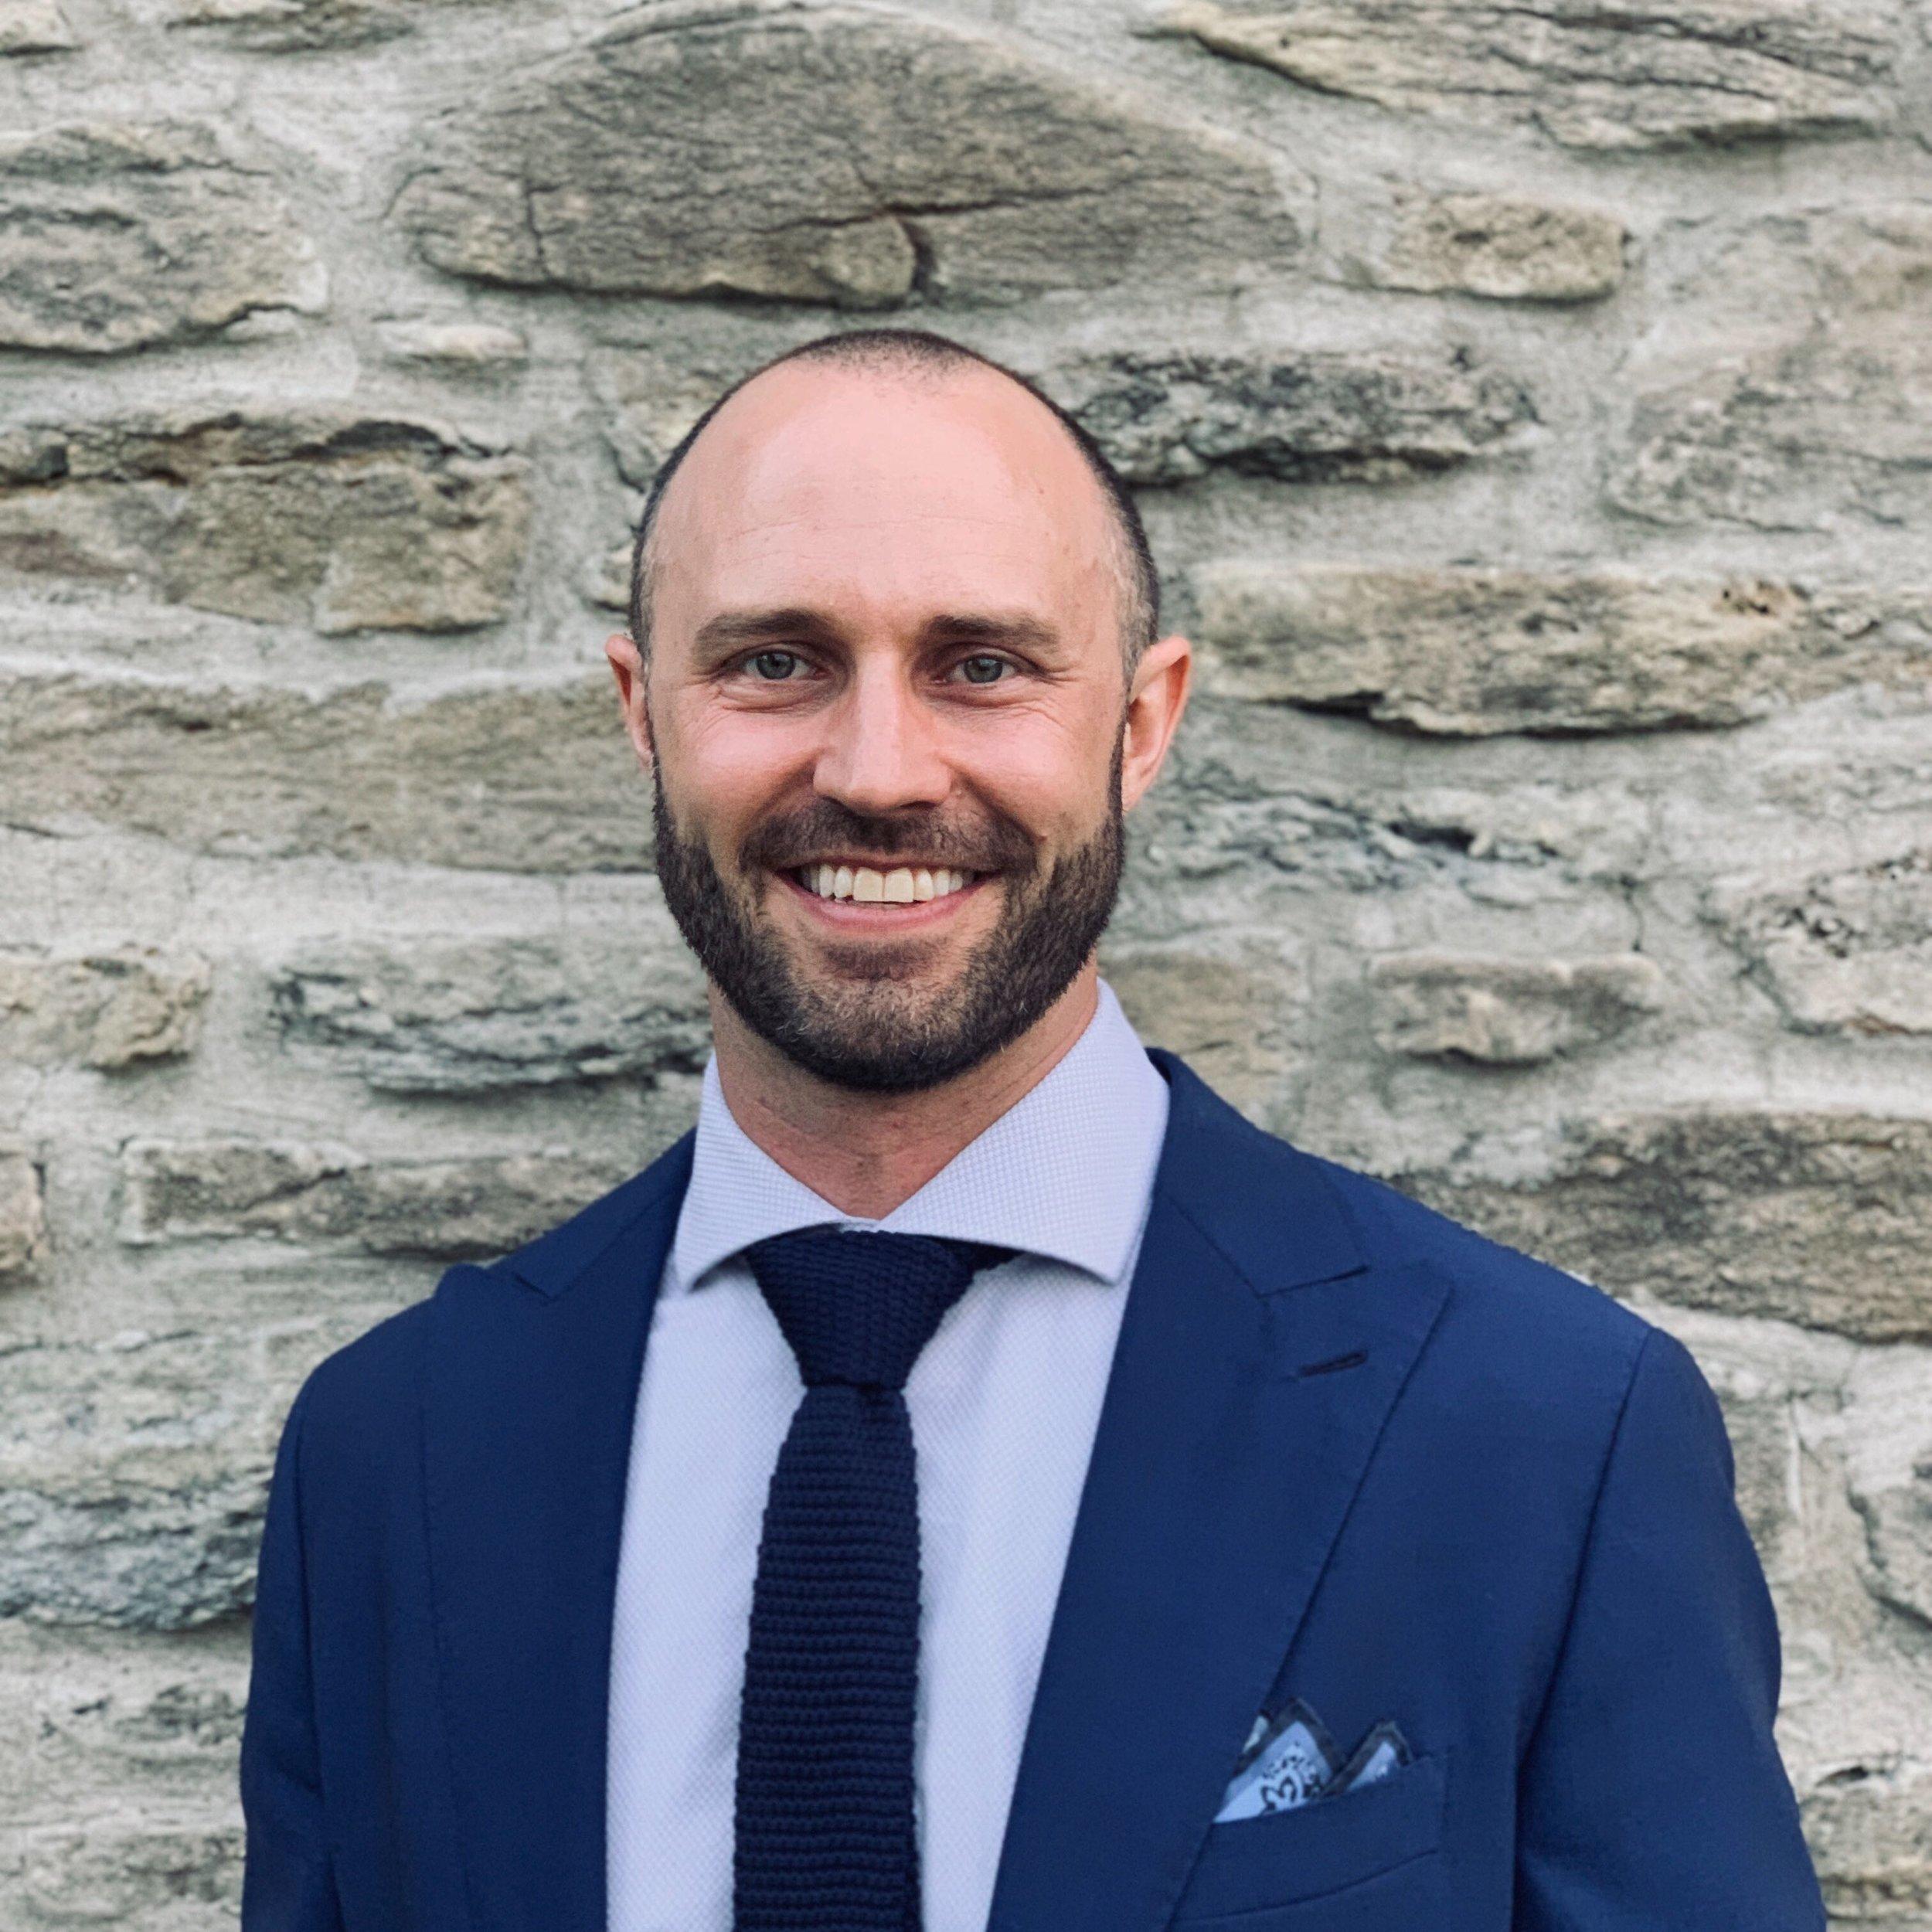 Dustin - Former UC Quarterback, Meat-head & Serial Entrepreneur